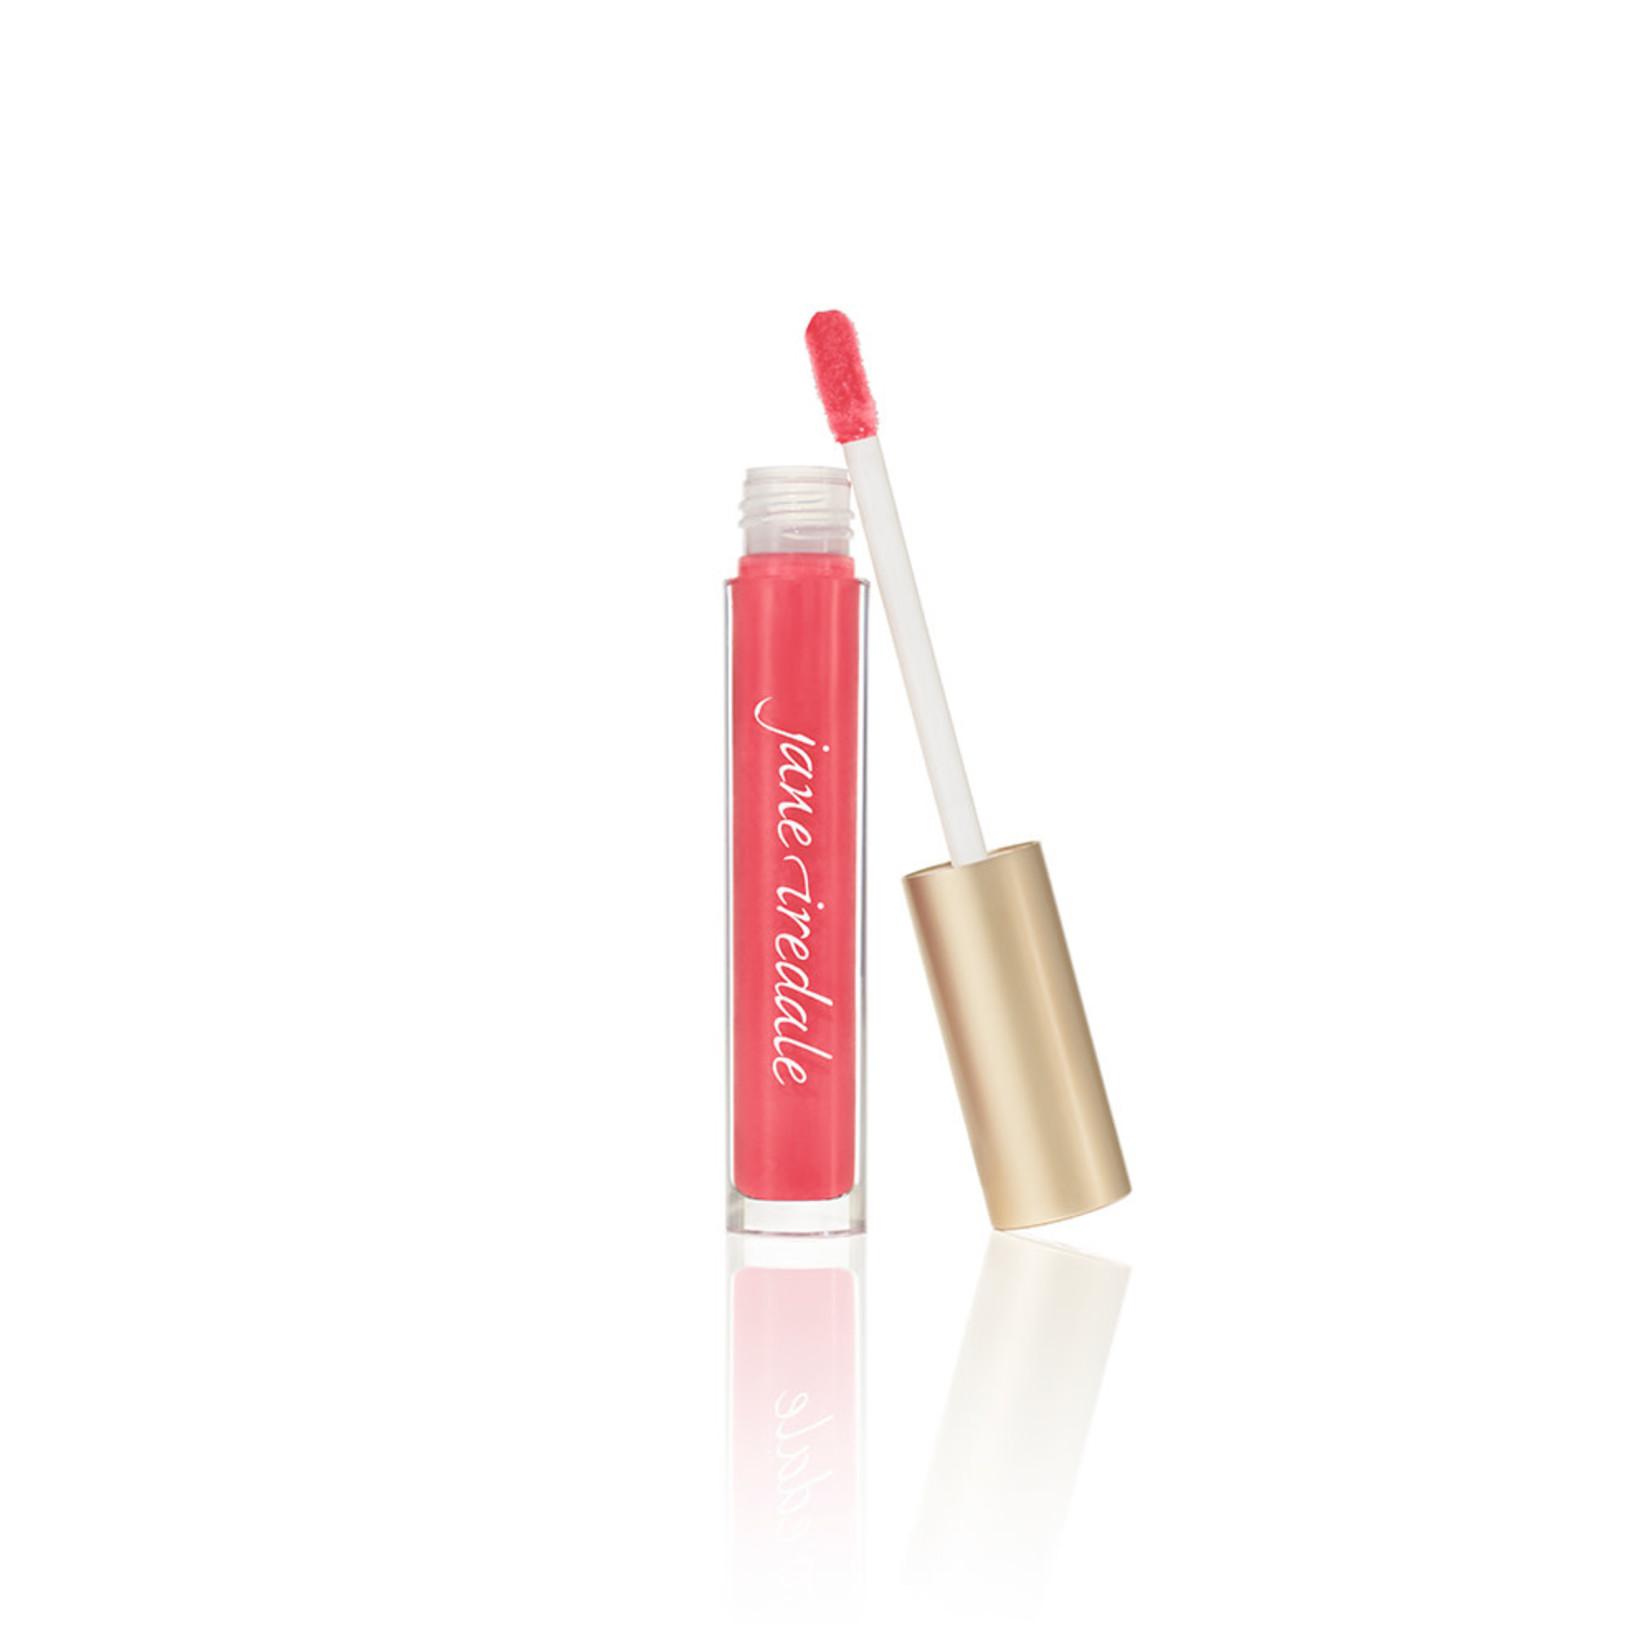 jane iredale Hyaluronic lip gloss - summer peach